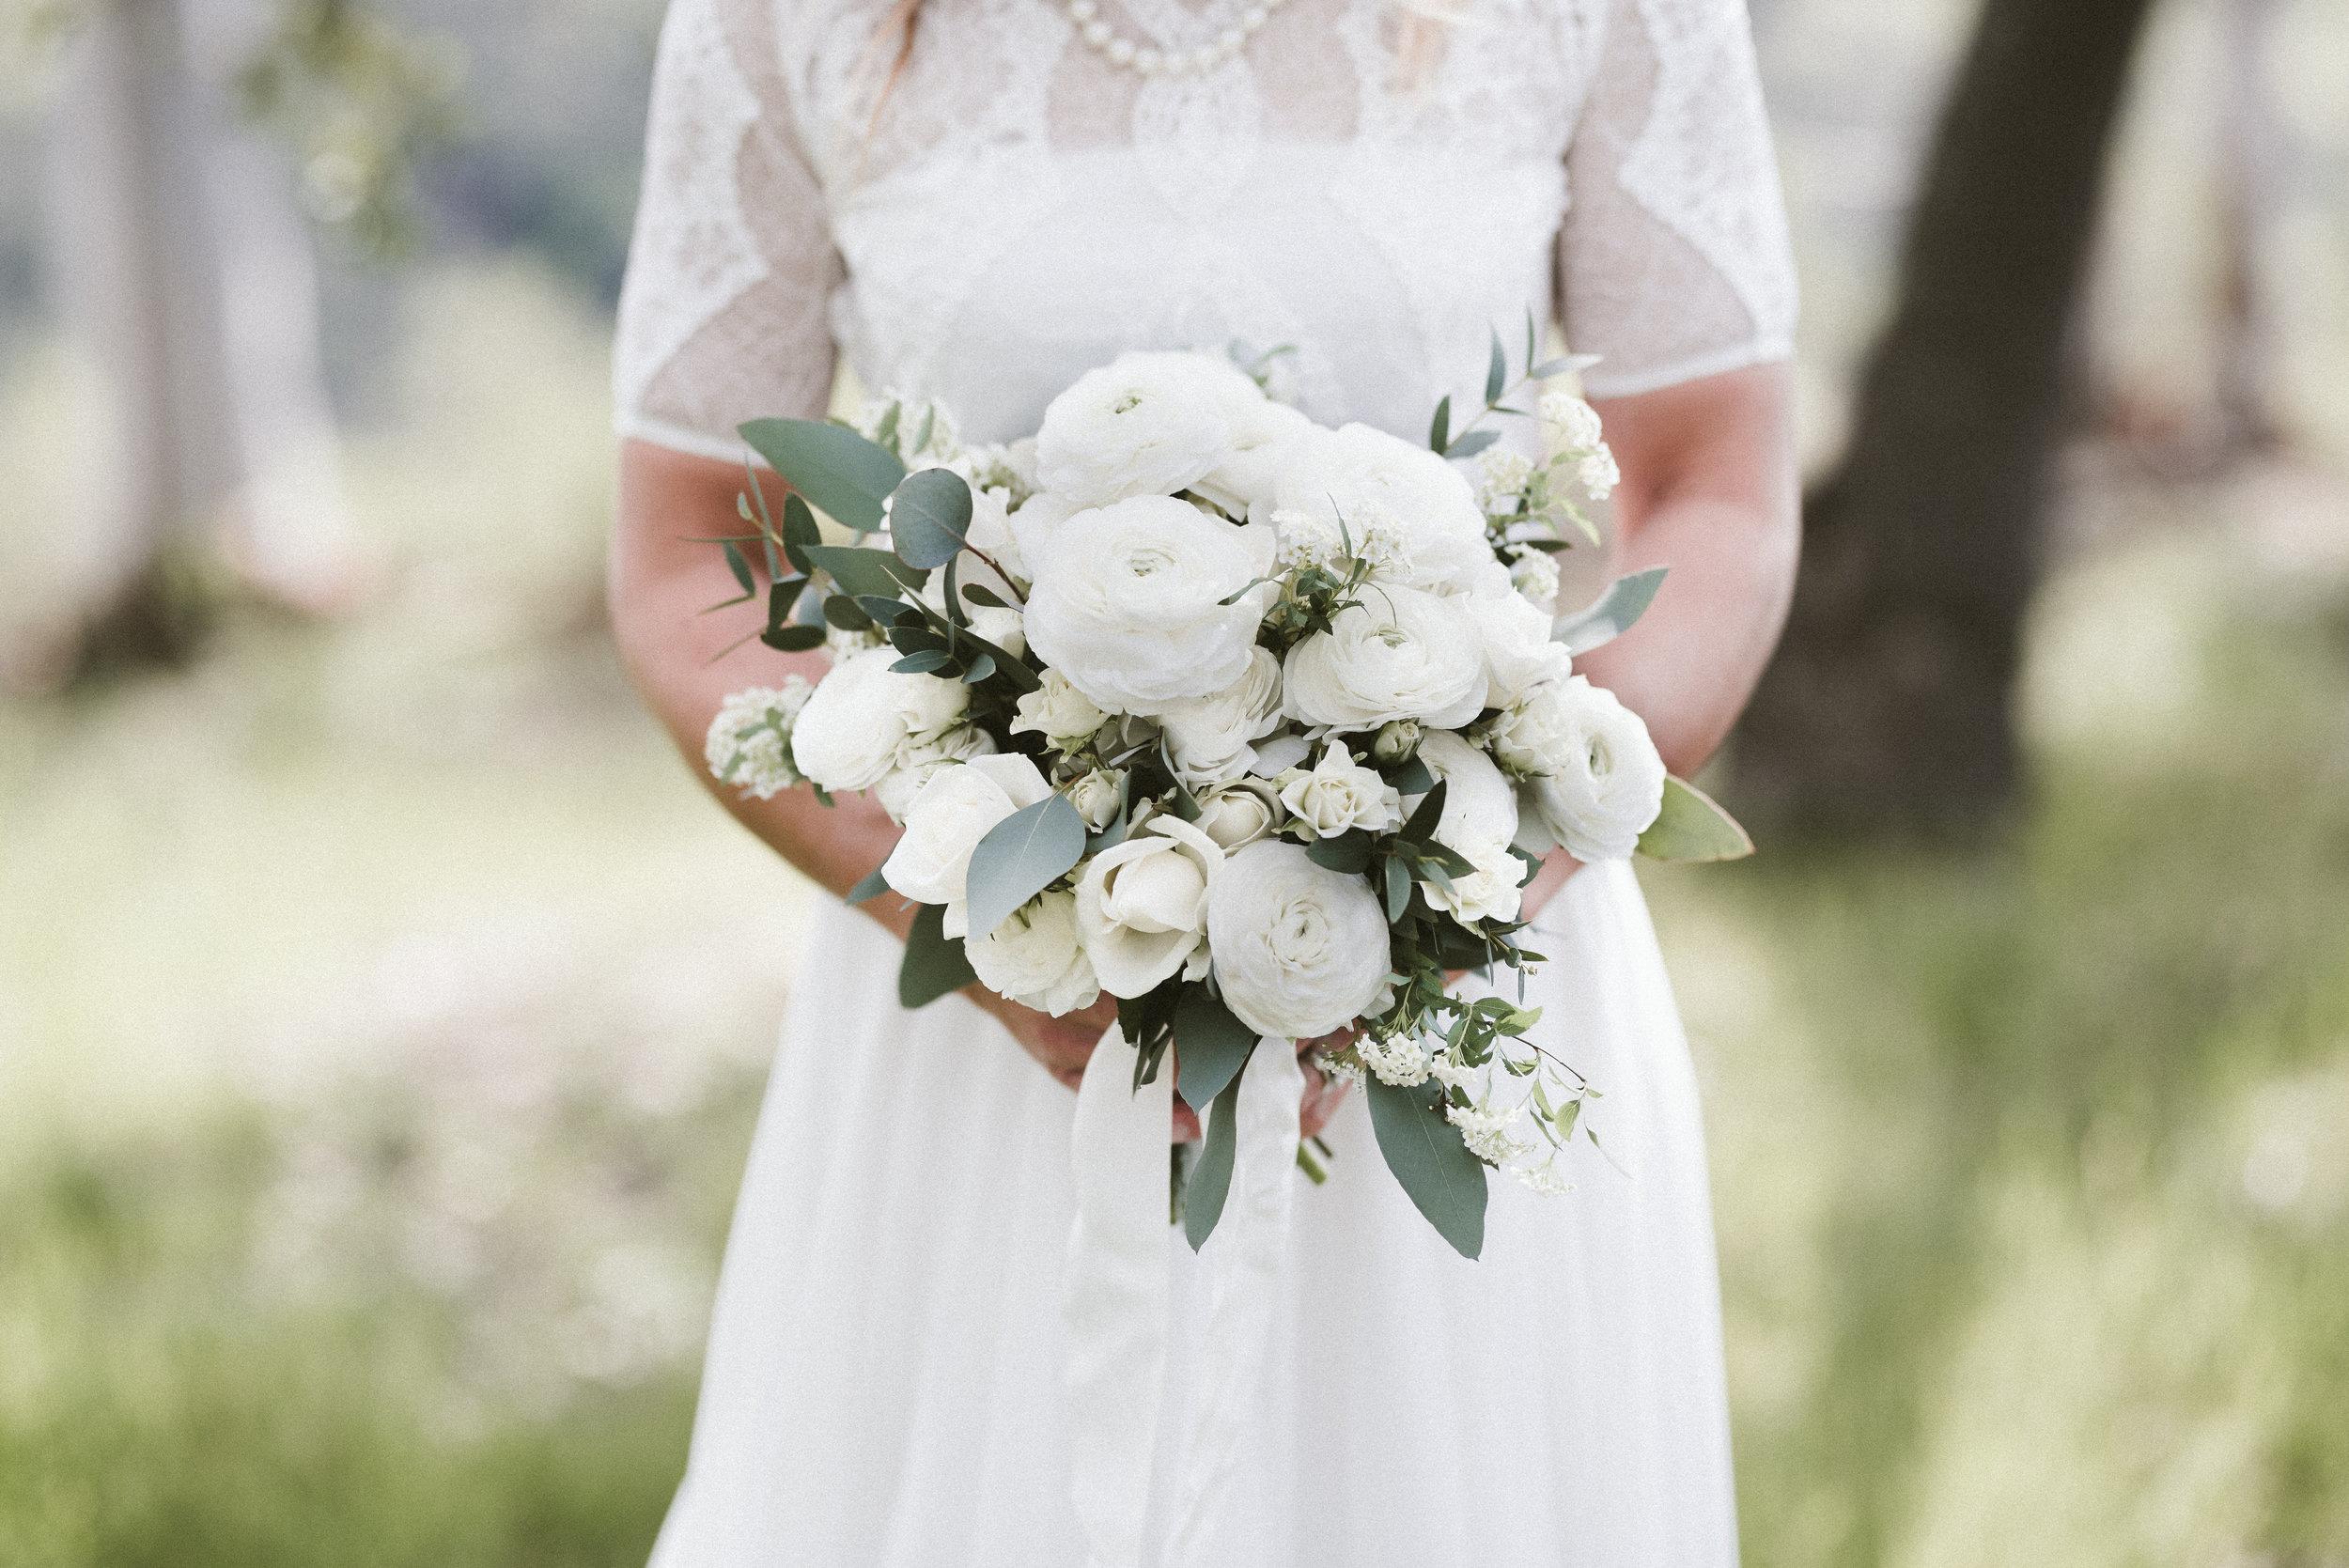 Bridal Bouquet Tony-Gambino-Photography-1035.jpg